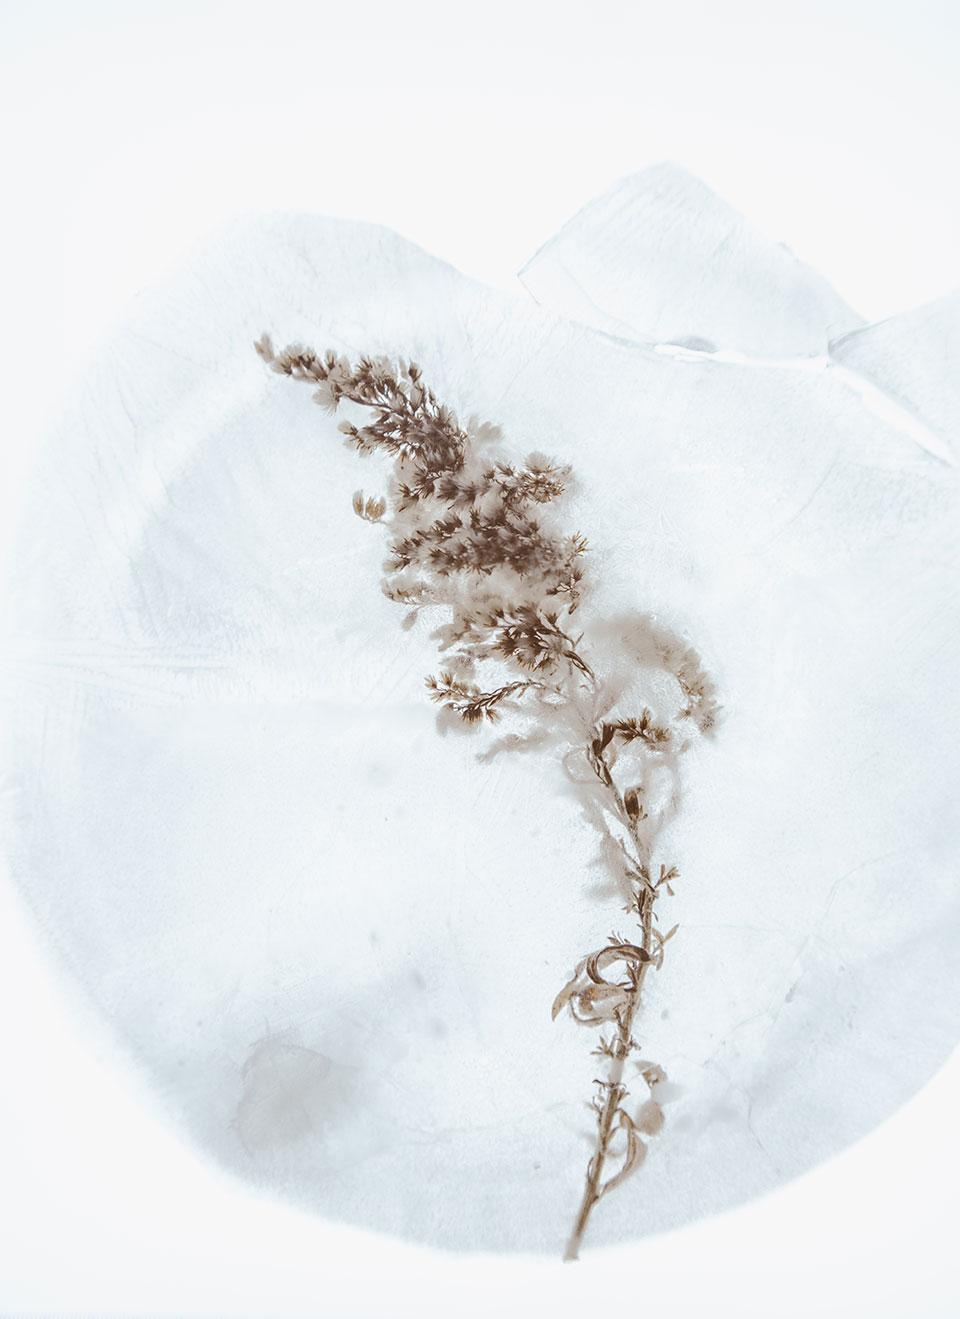 evie-furry-vegetation-photographer-tulsa-oklahoma-taylor-content.jpg